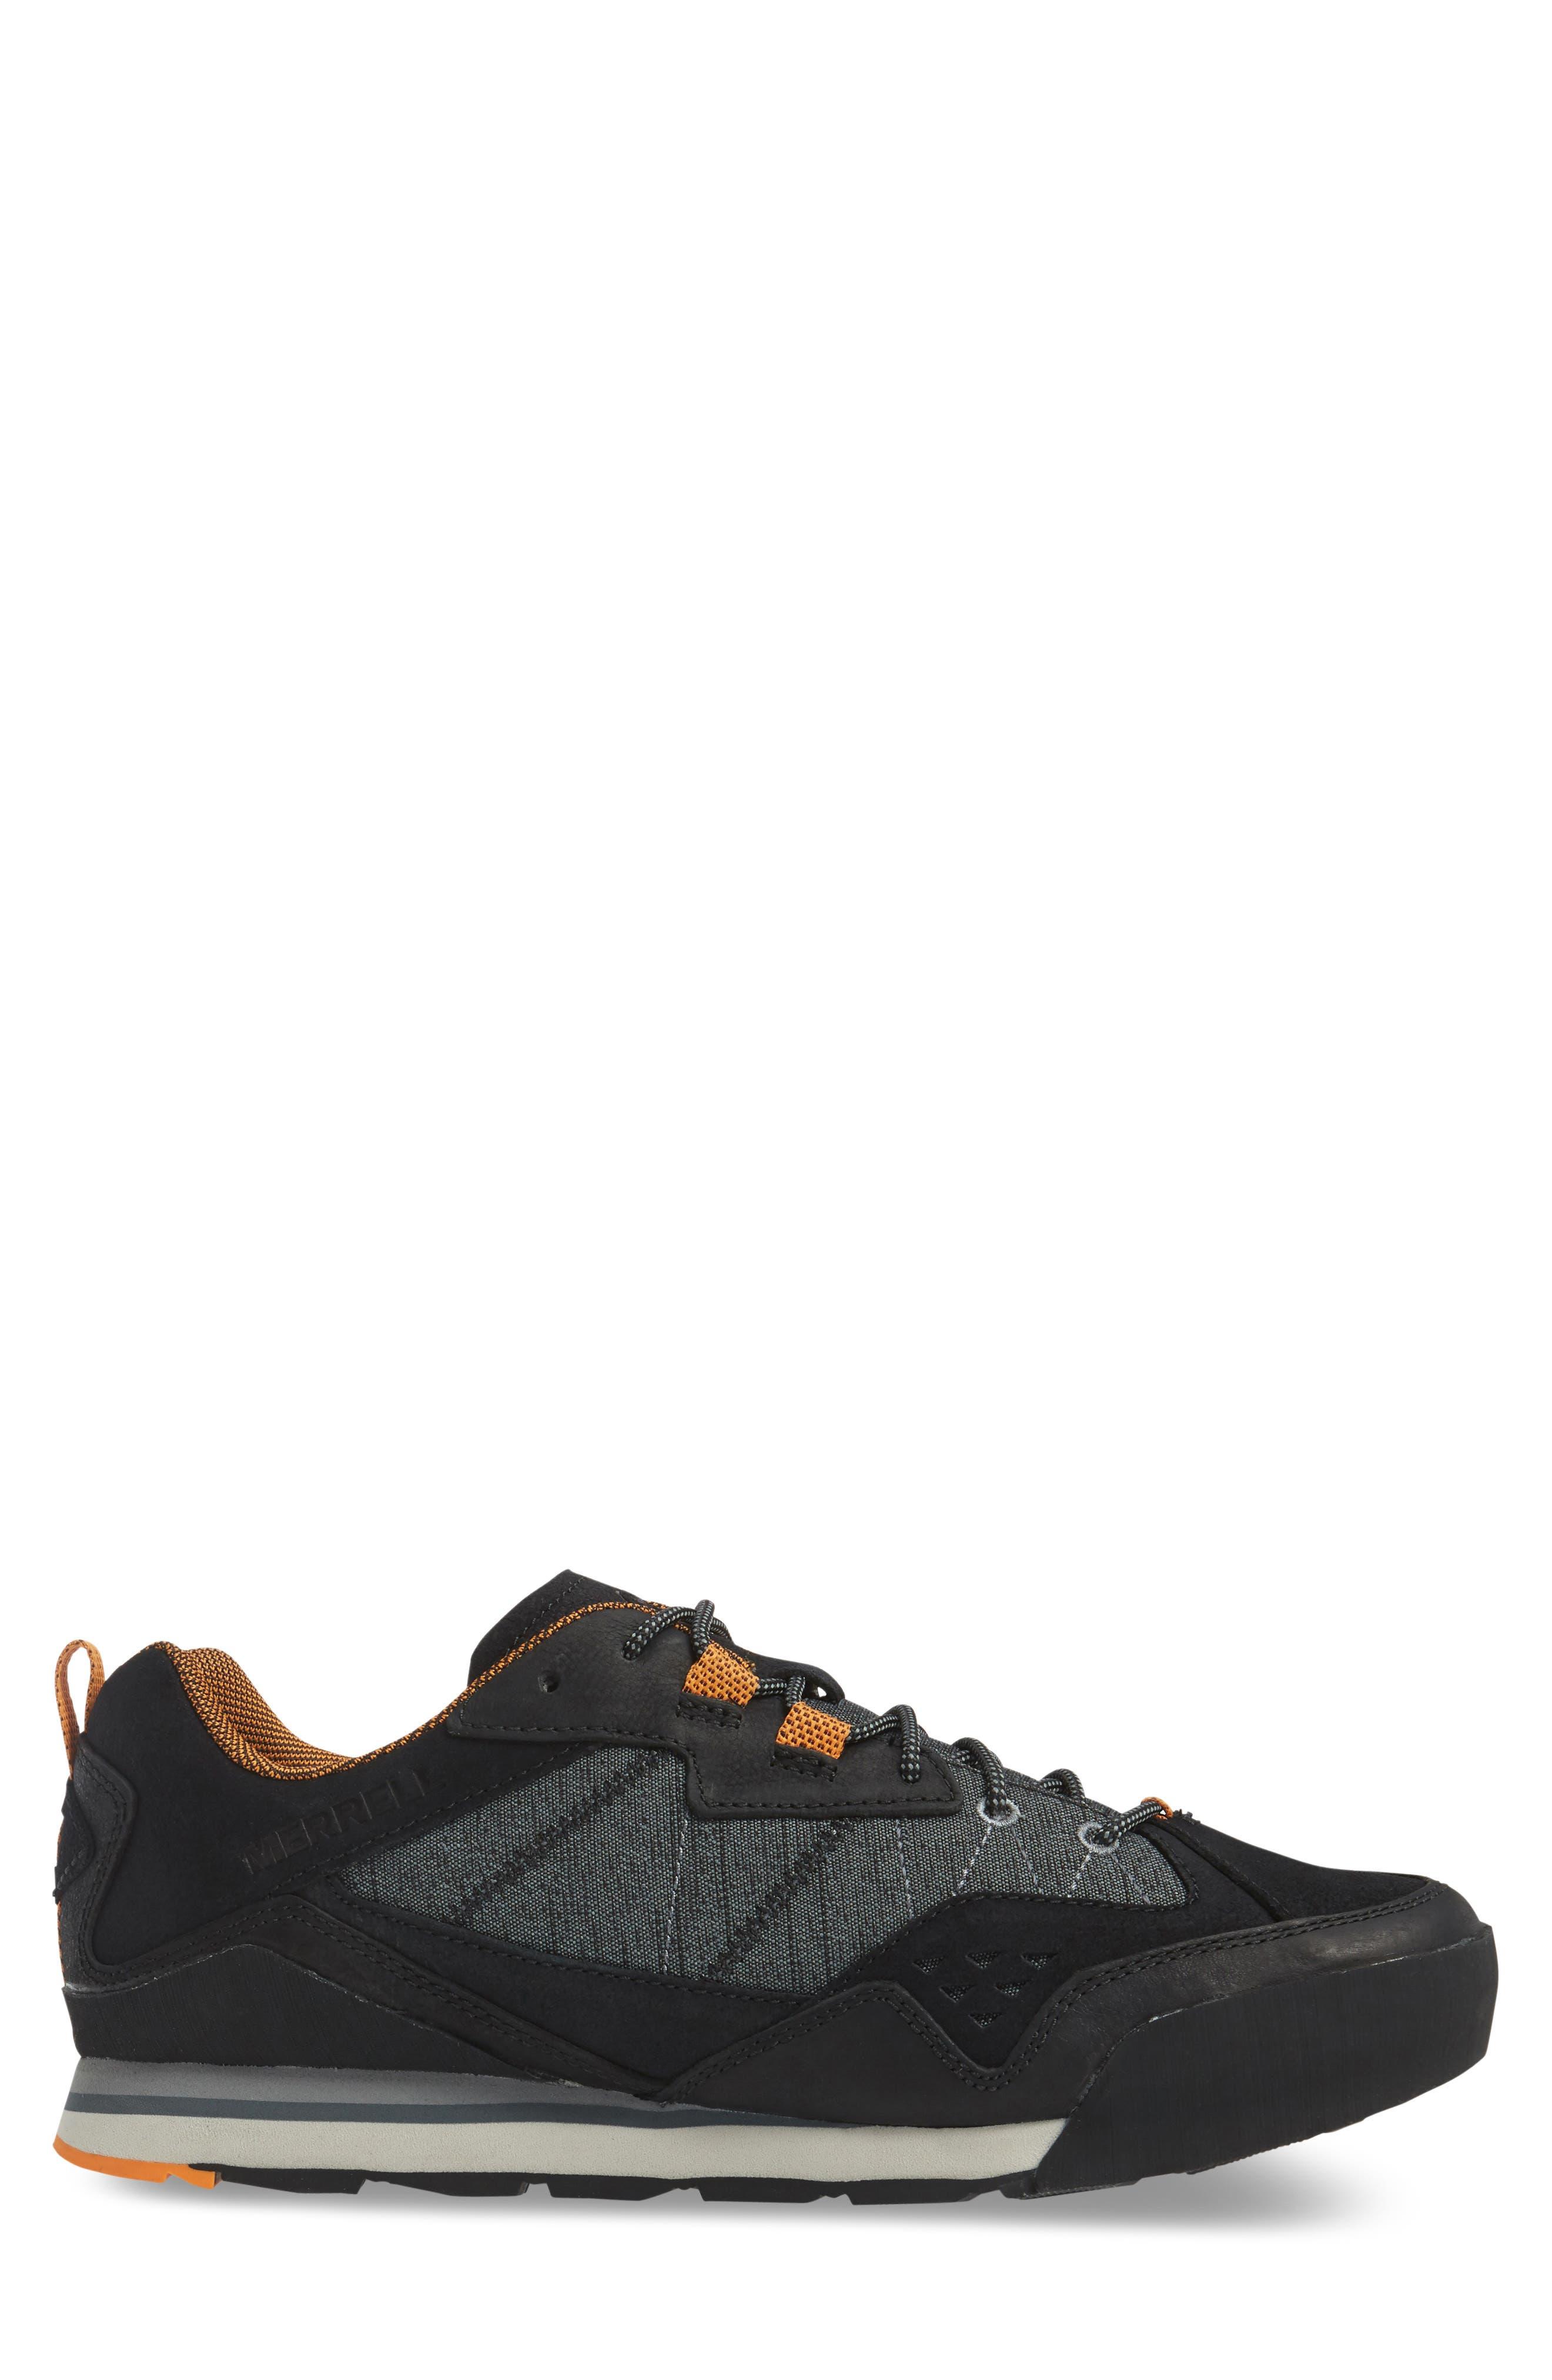 Burnt Rock Sneaker,                             Alternate thumbnail 3, color,                             Black